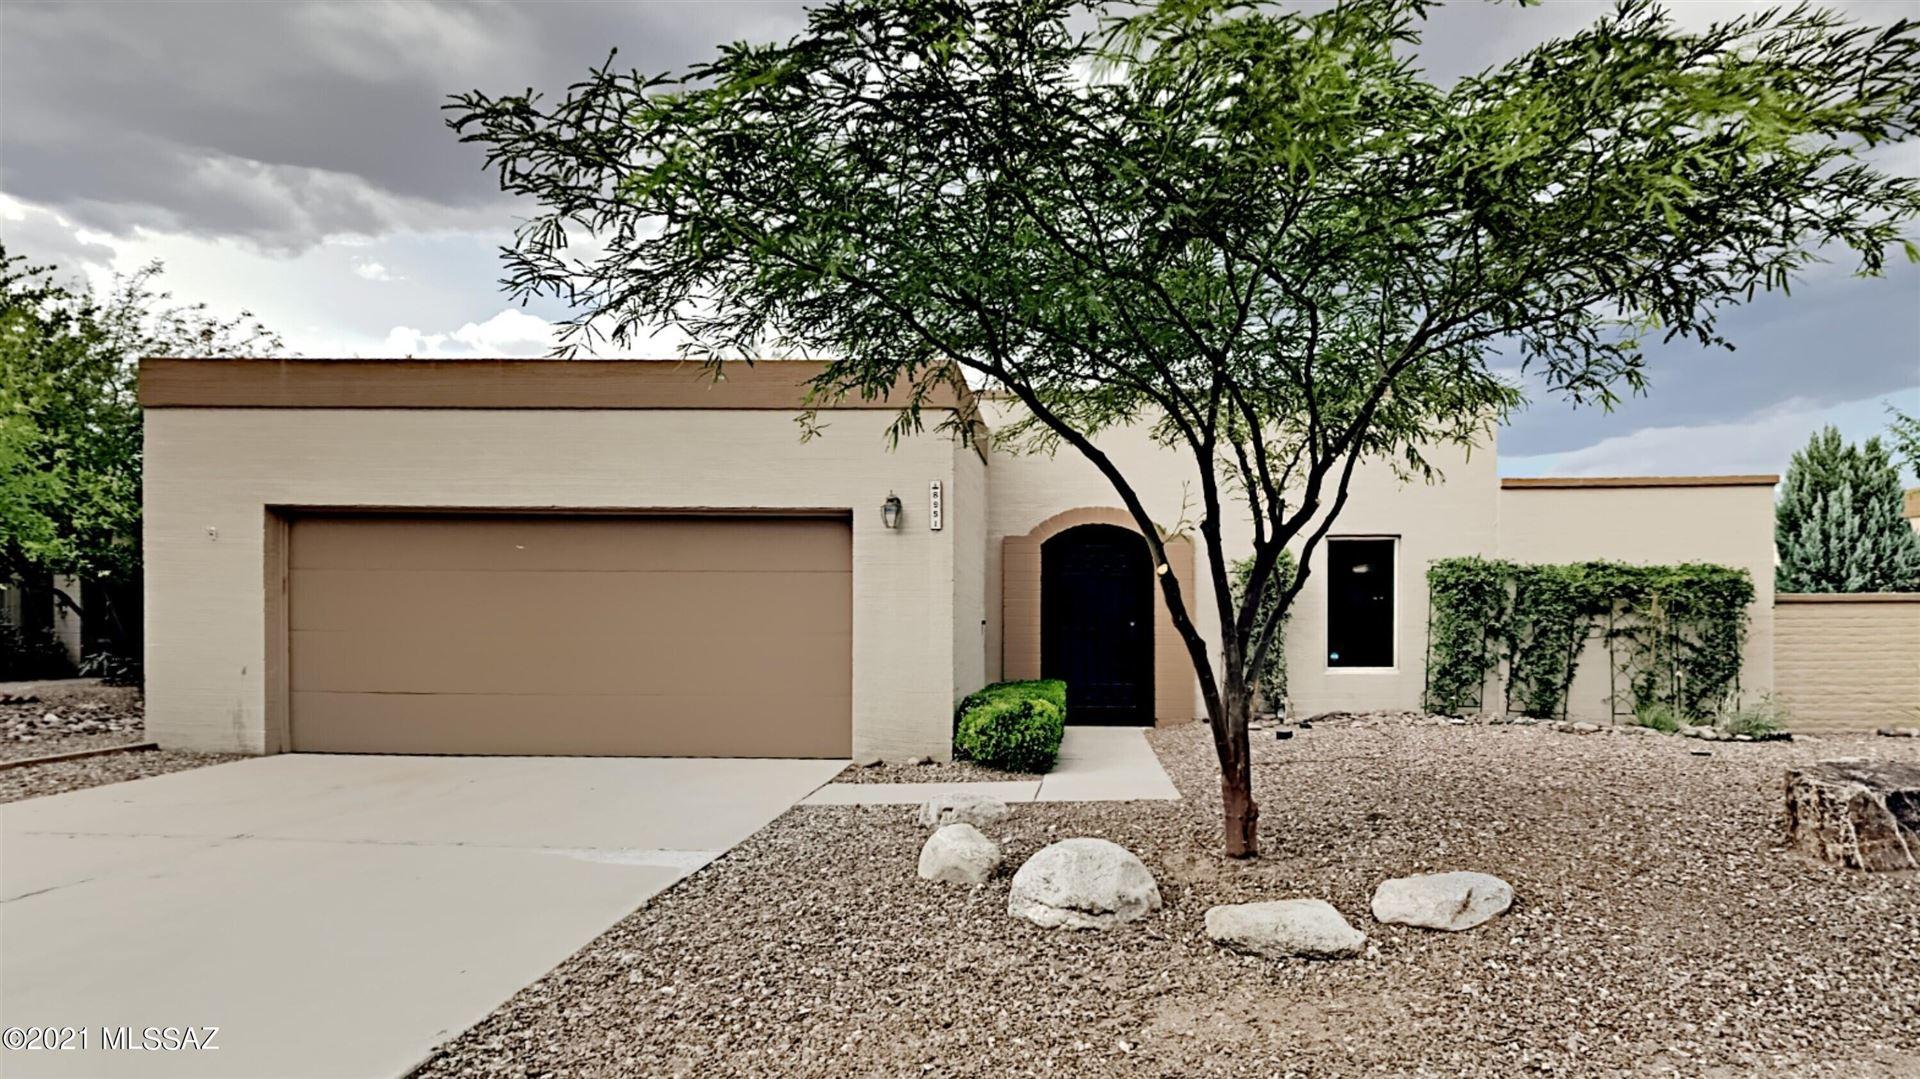 8951 E Seneca Street, Tucson, AZ 85715 - #: 22117204